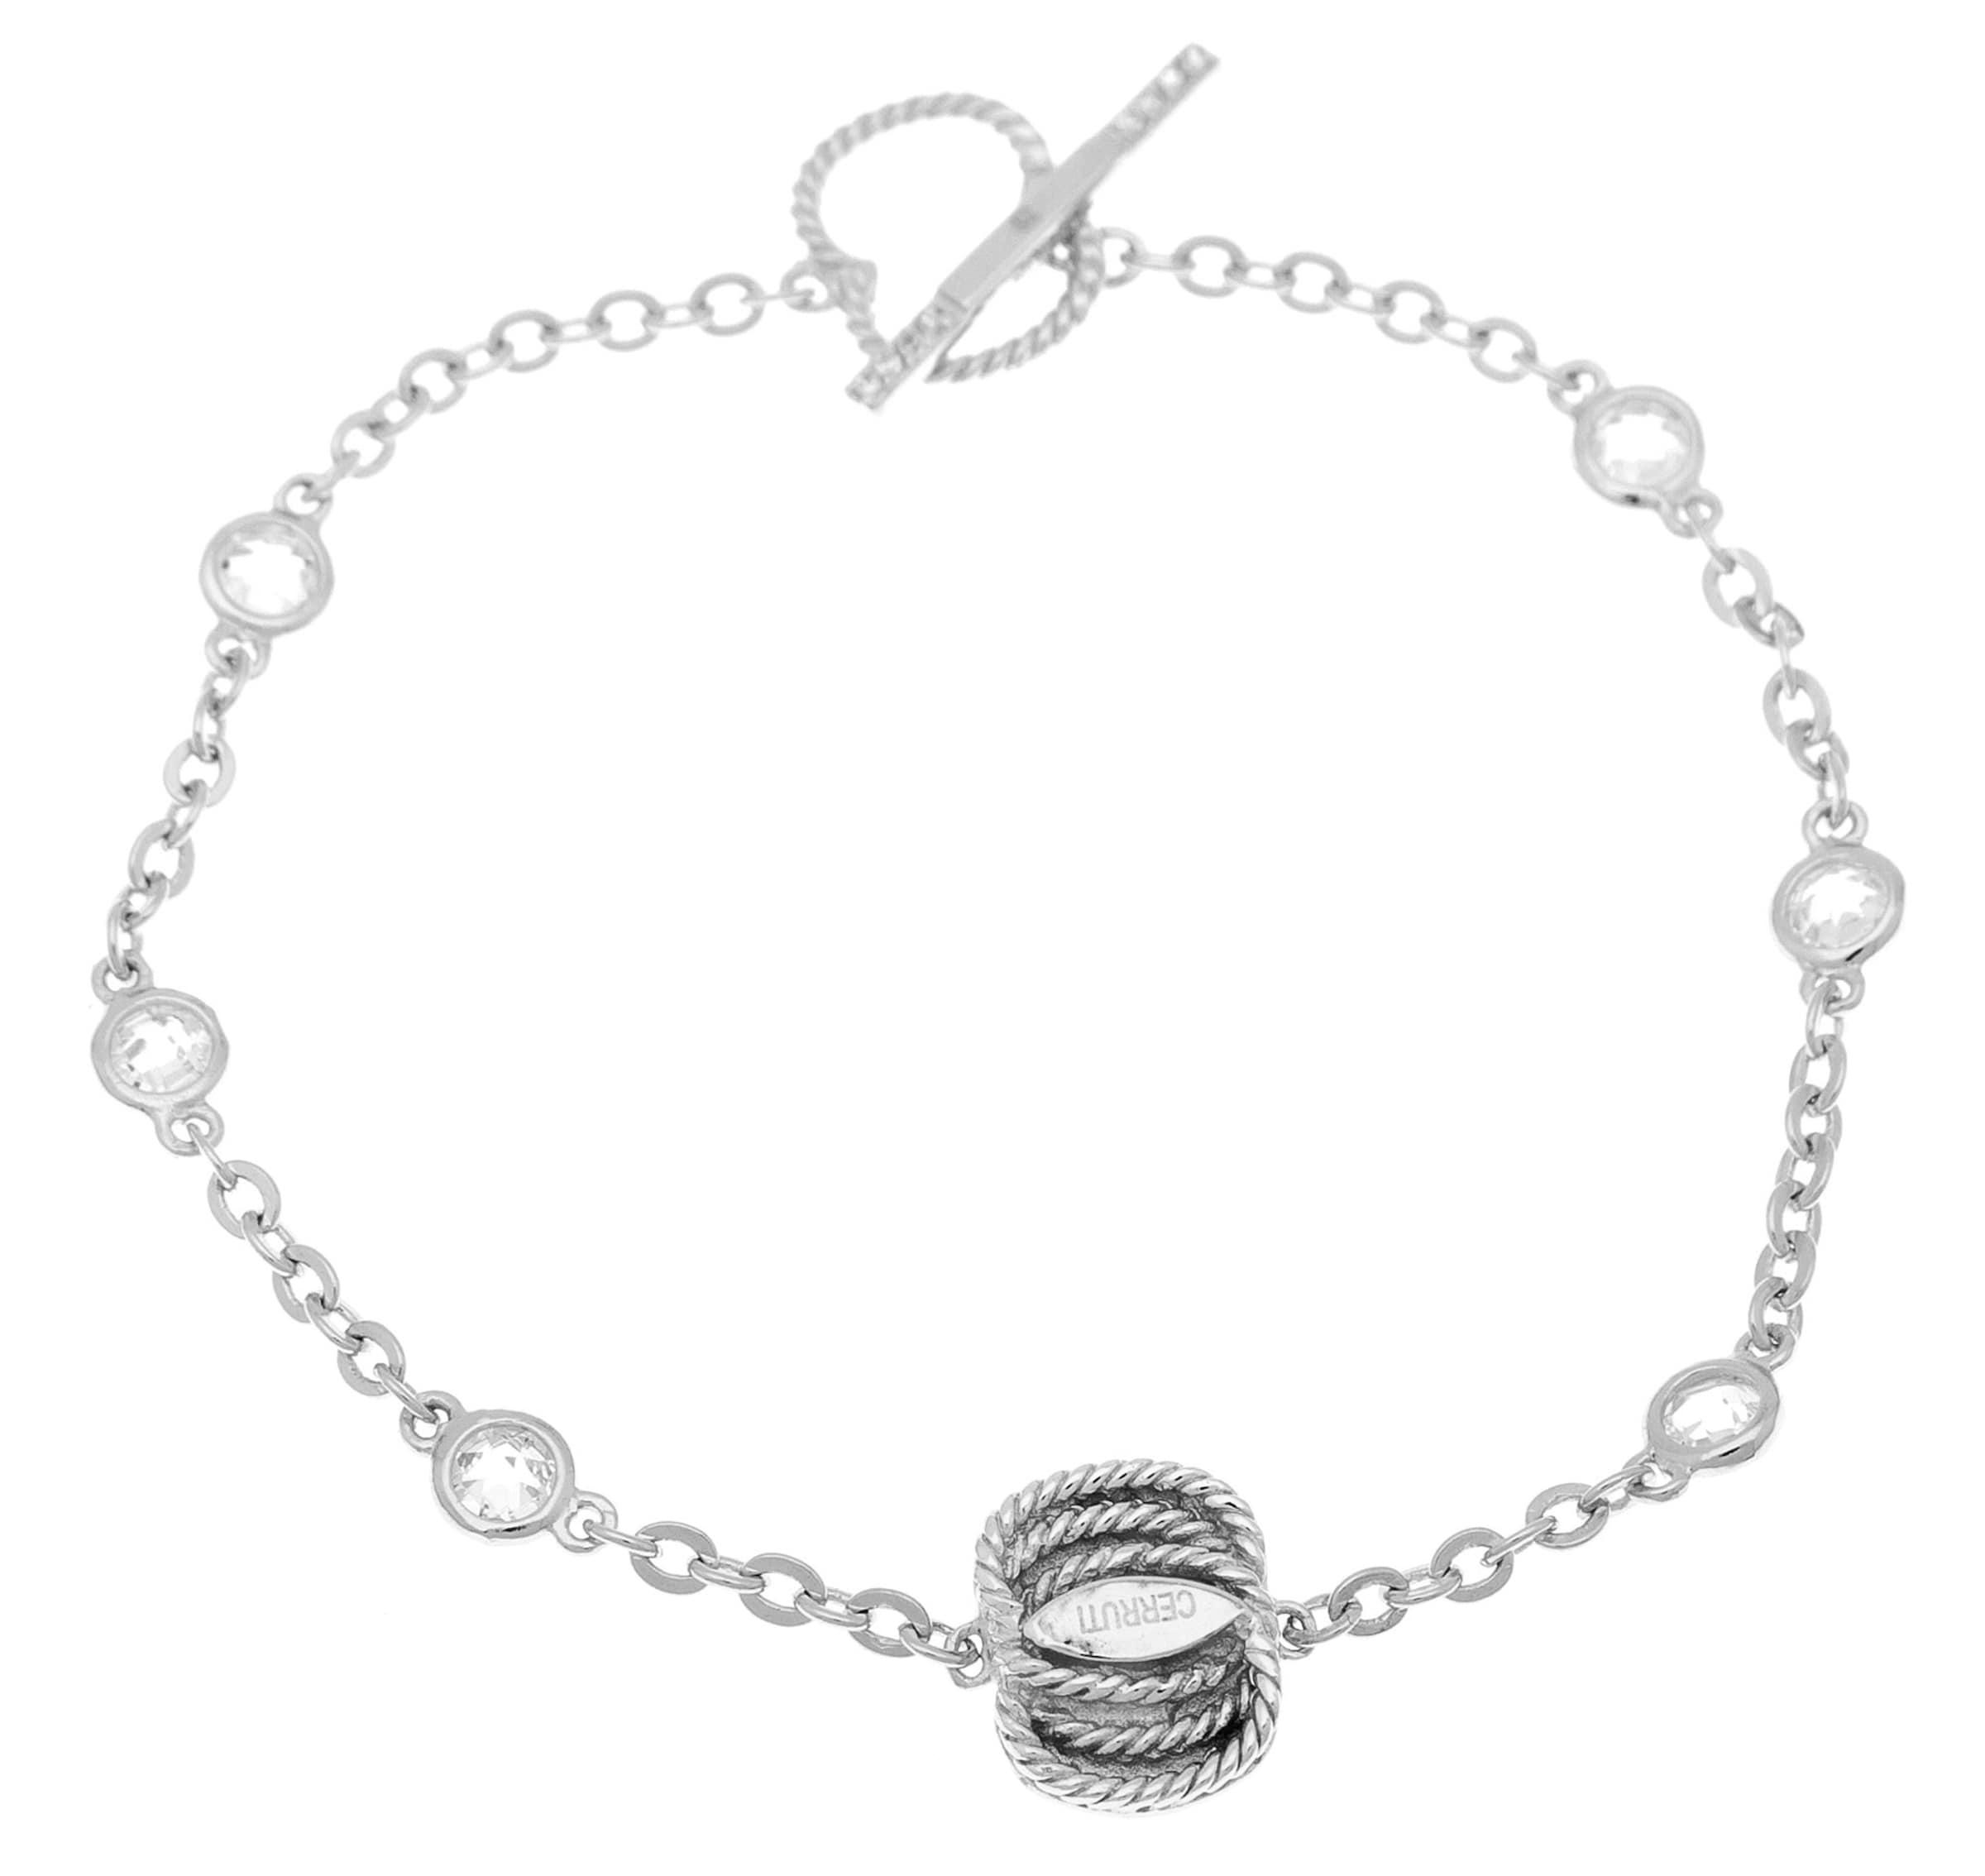 Preise Online-Verkauf Footlocker Finish Verkauf Online CERRUTI Armband 'R52009' UnuLgTO7Z